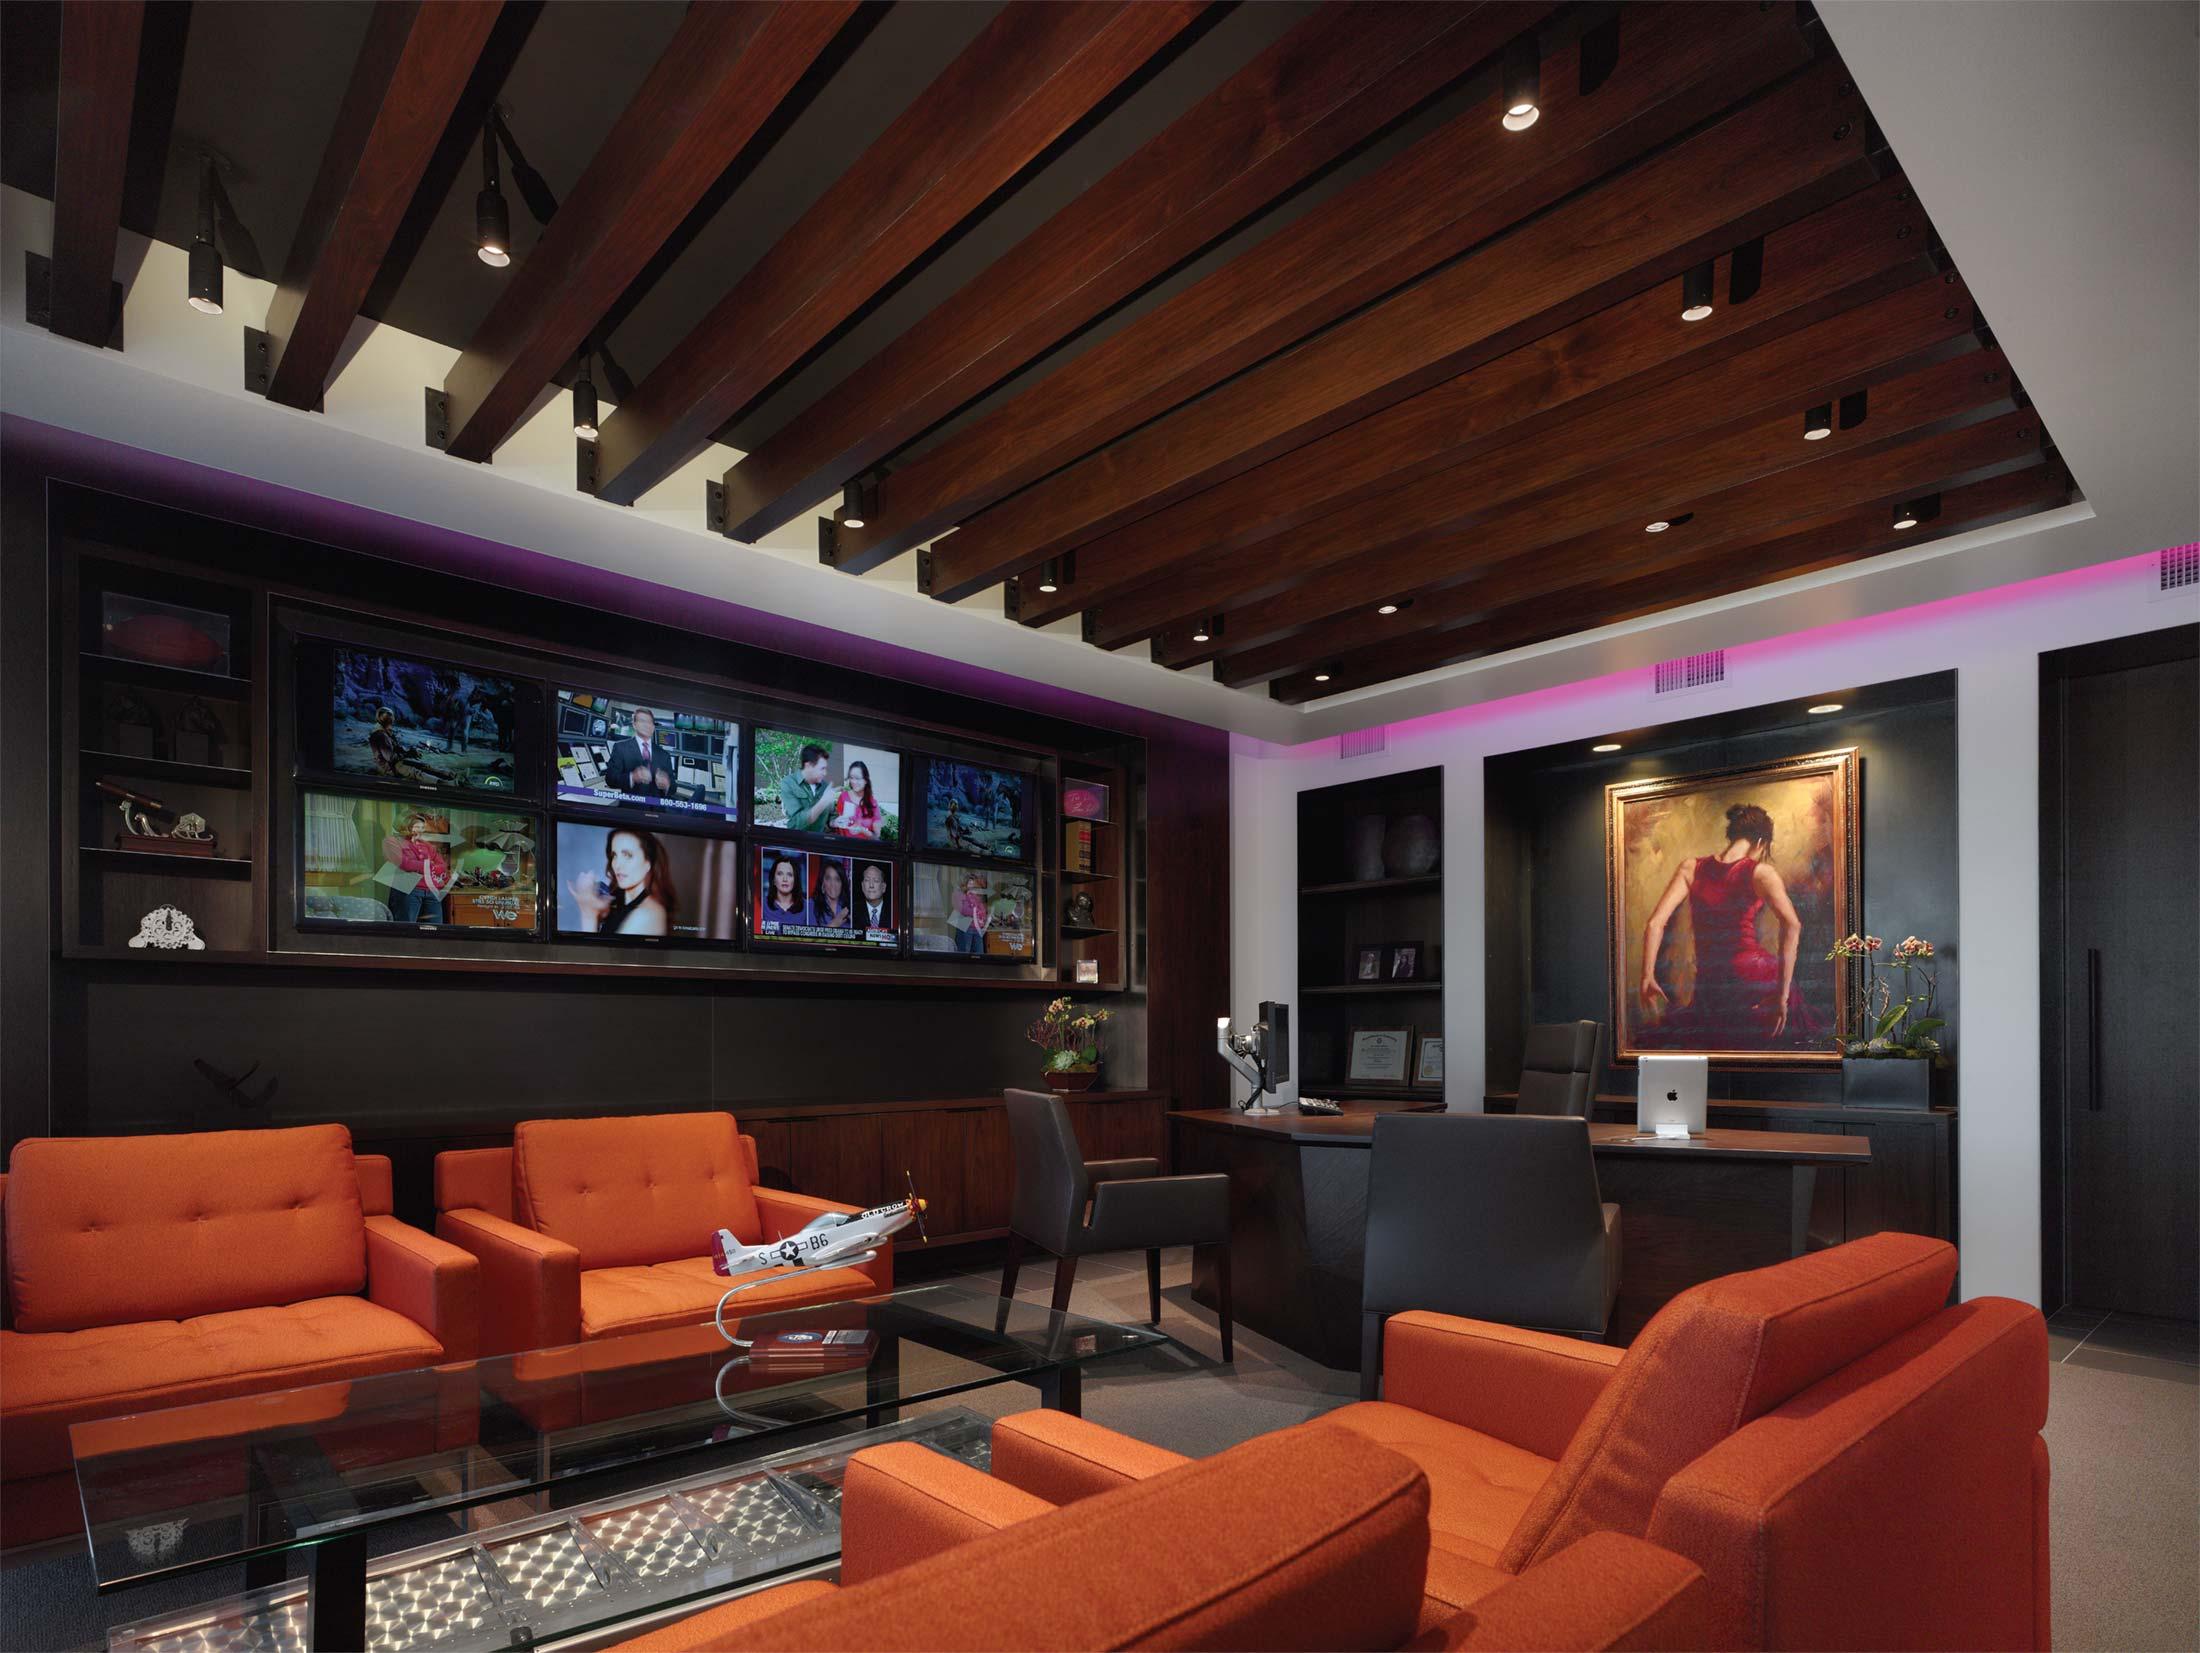 modern-architecture-commercial-interiors-workplace-office-branded-custom-workstation-california-shubindonaldson-intermedia-09